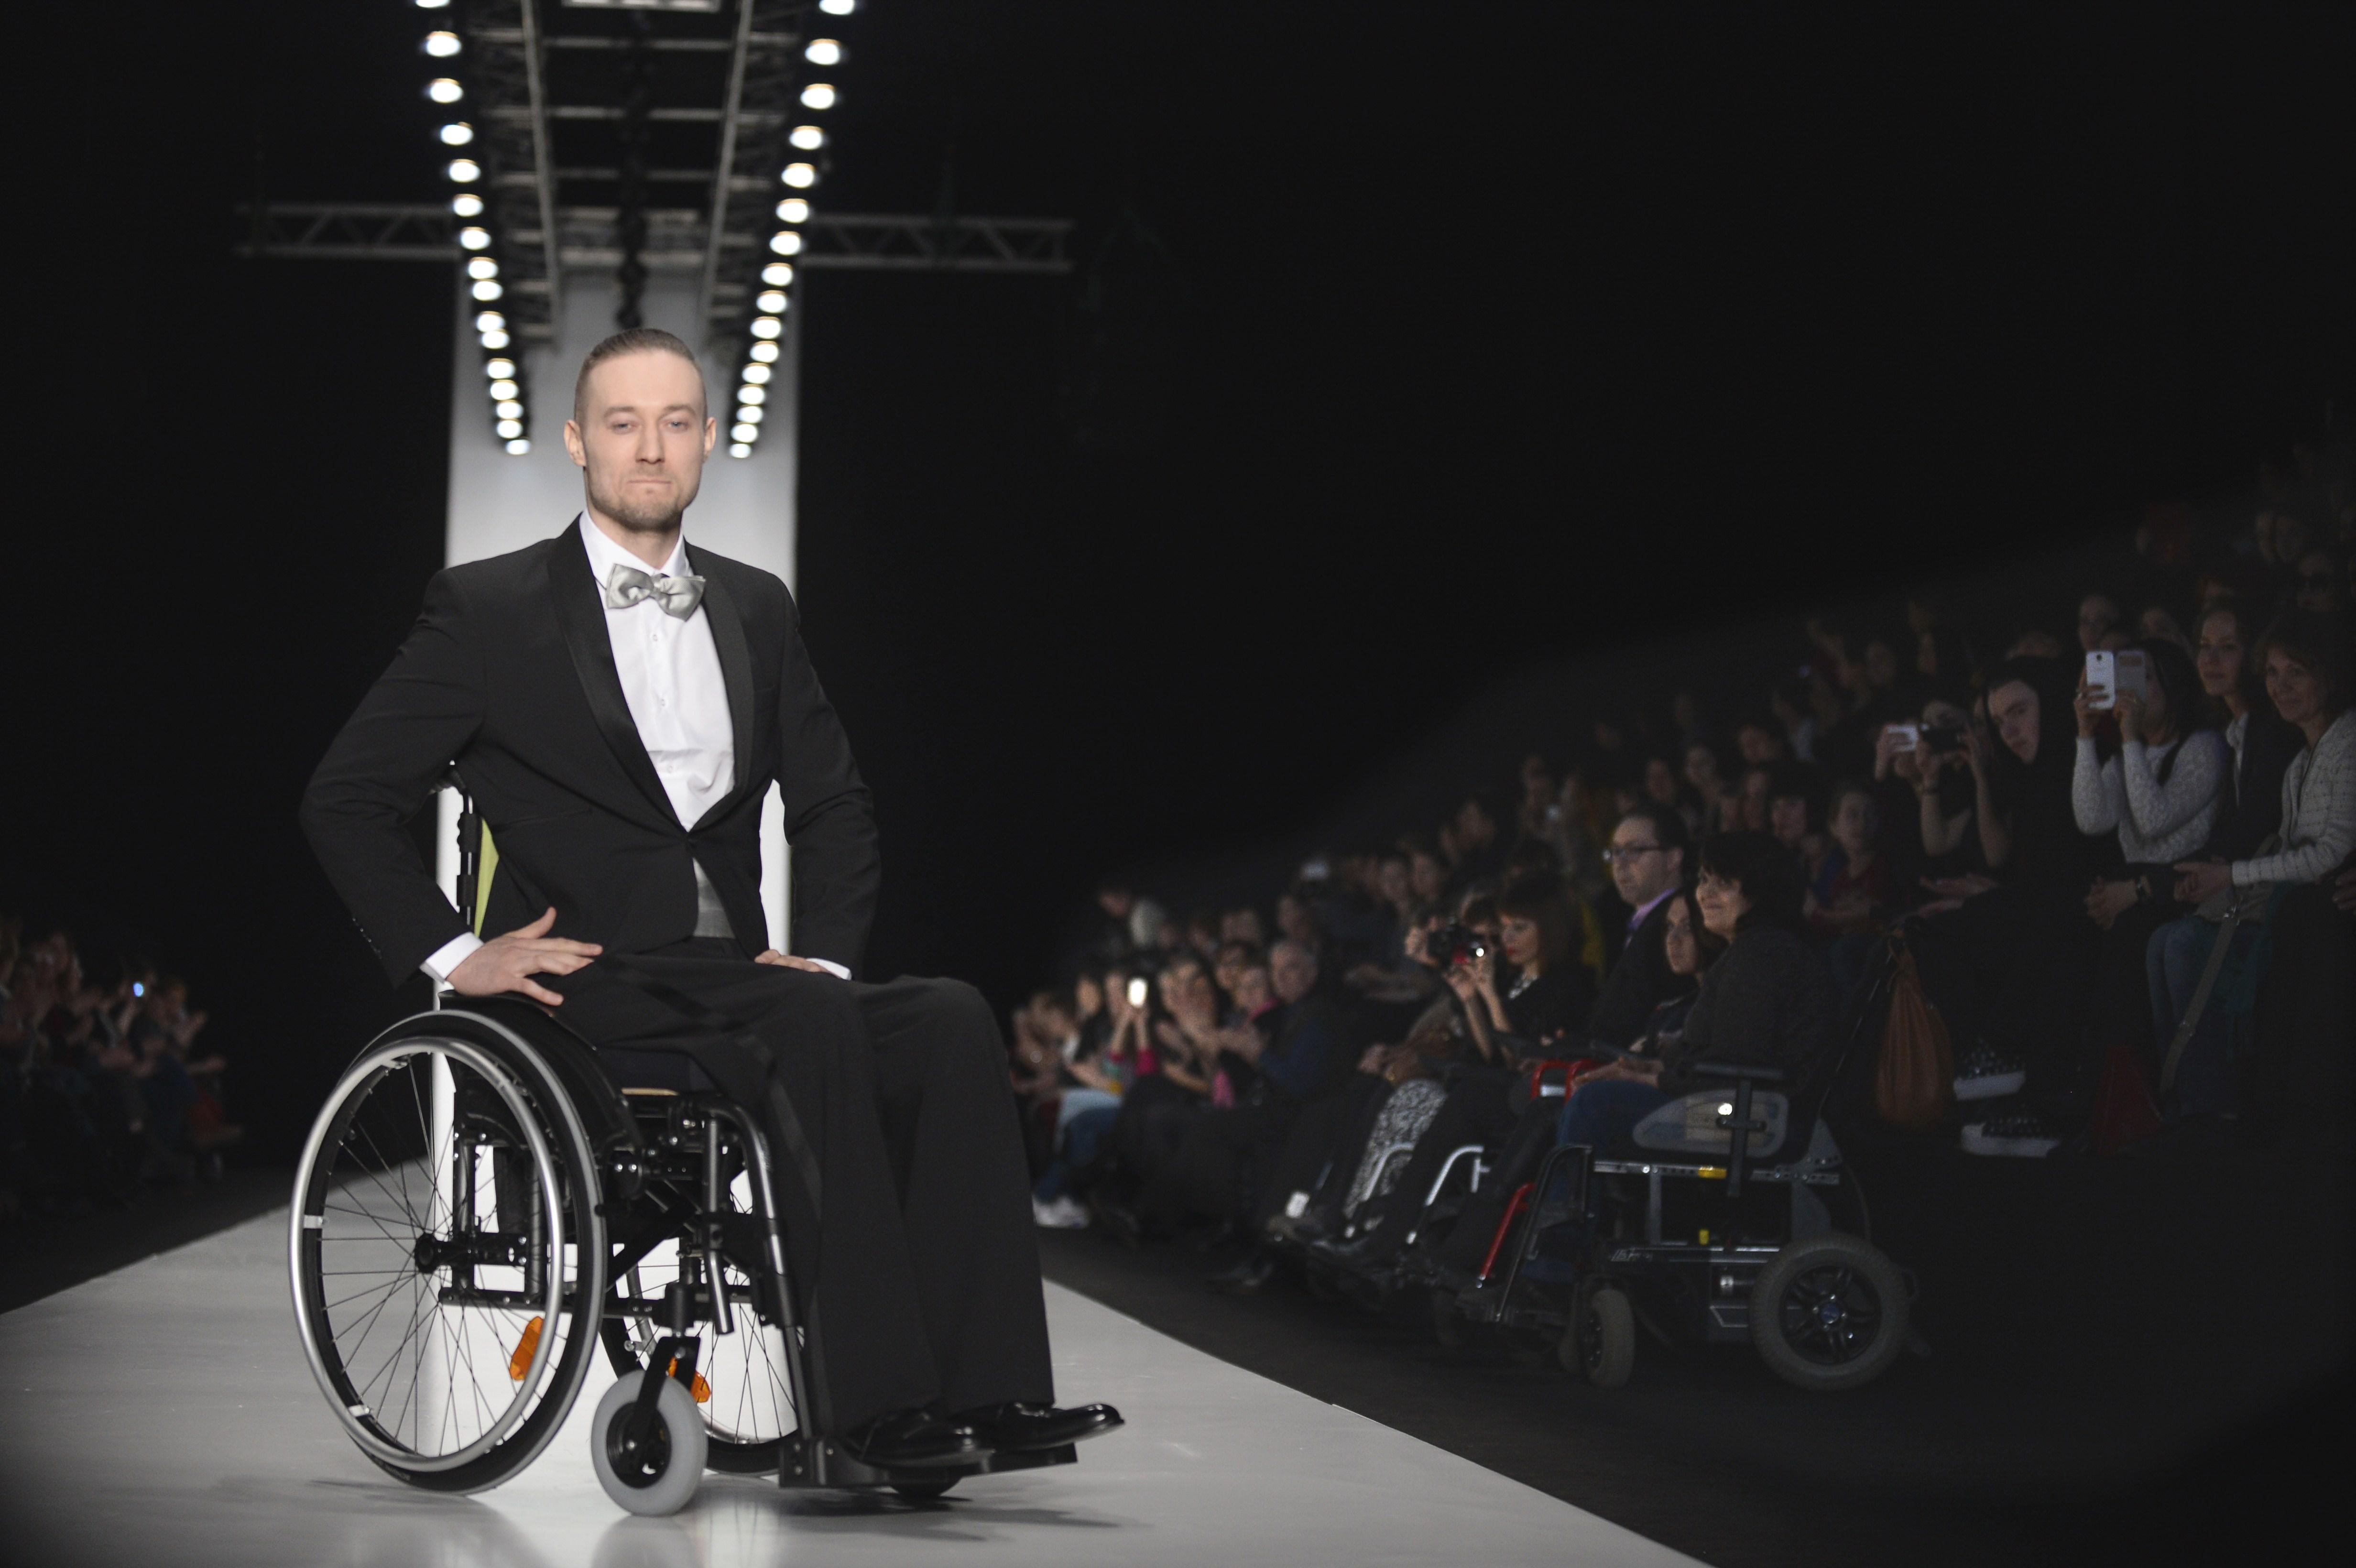 Funzionali ma eleganti, arrivano gli abiti per i portatori di handicap